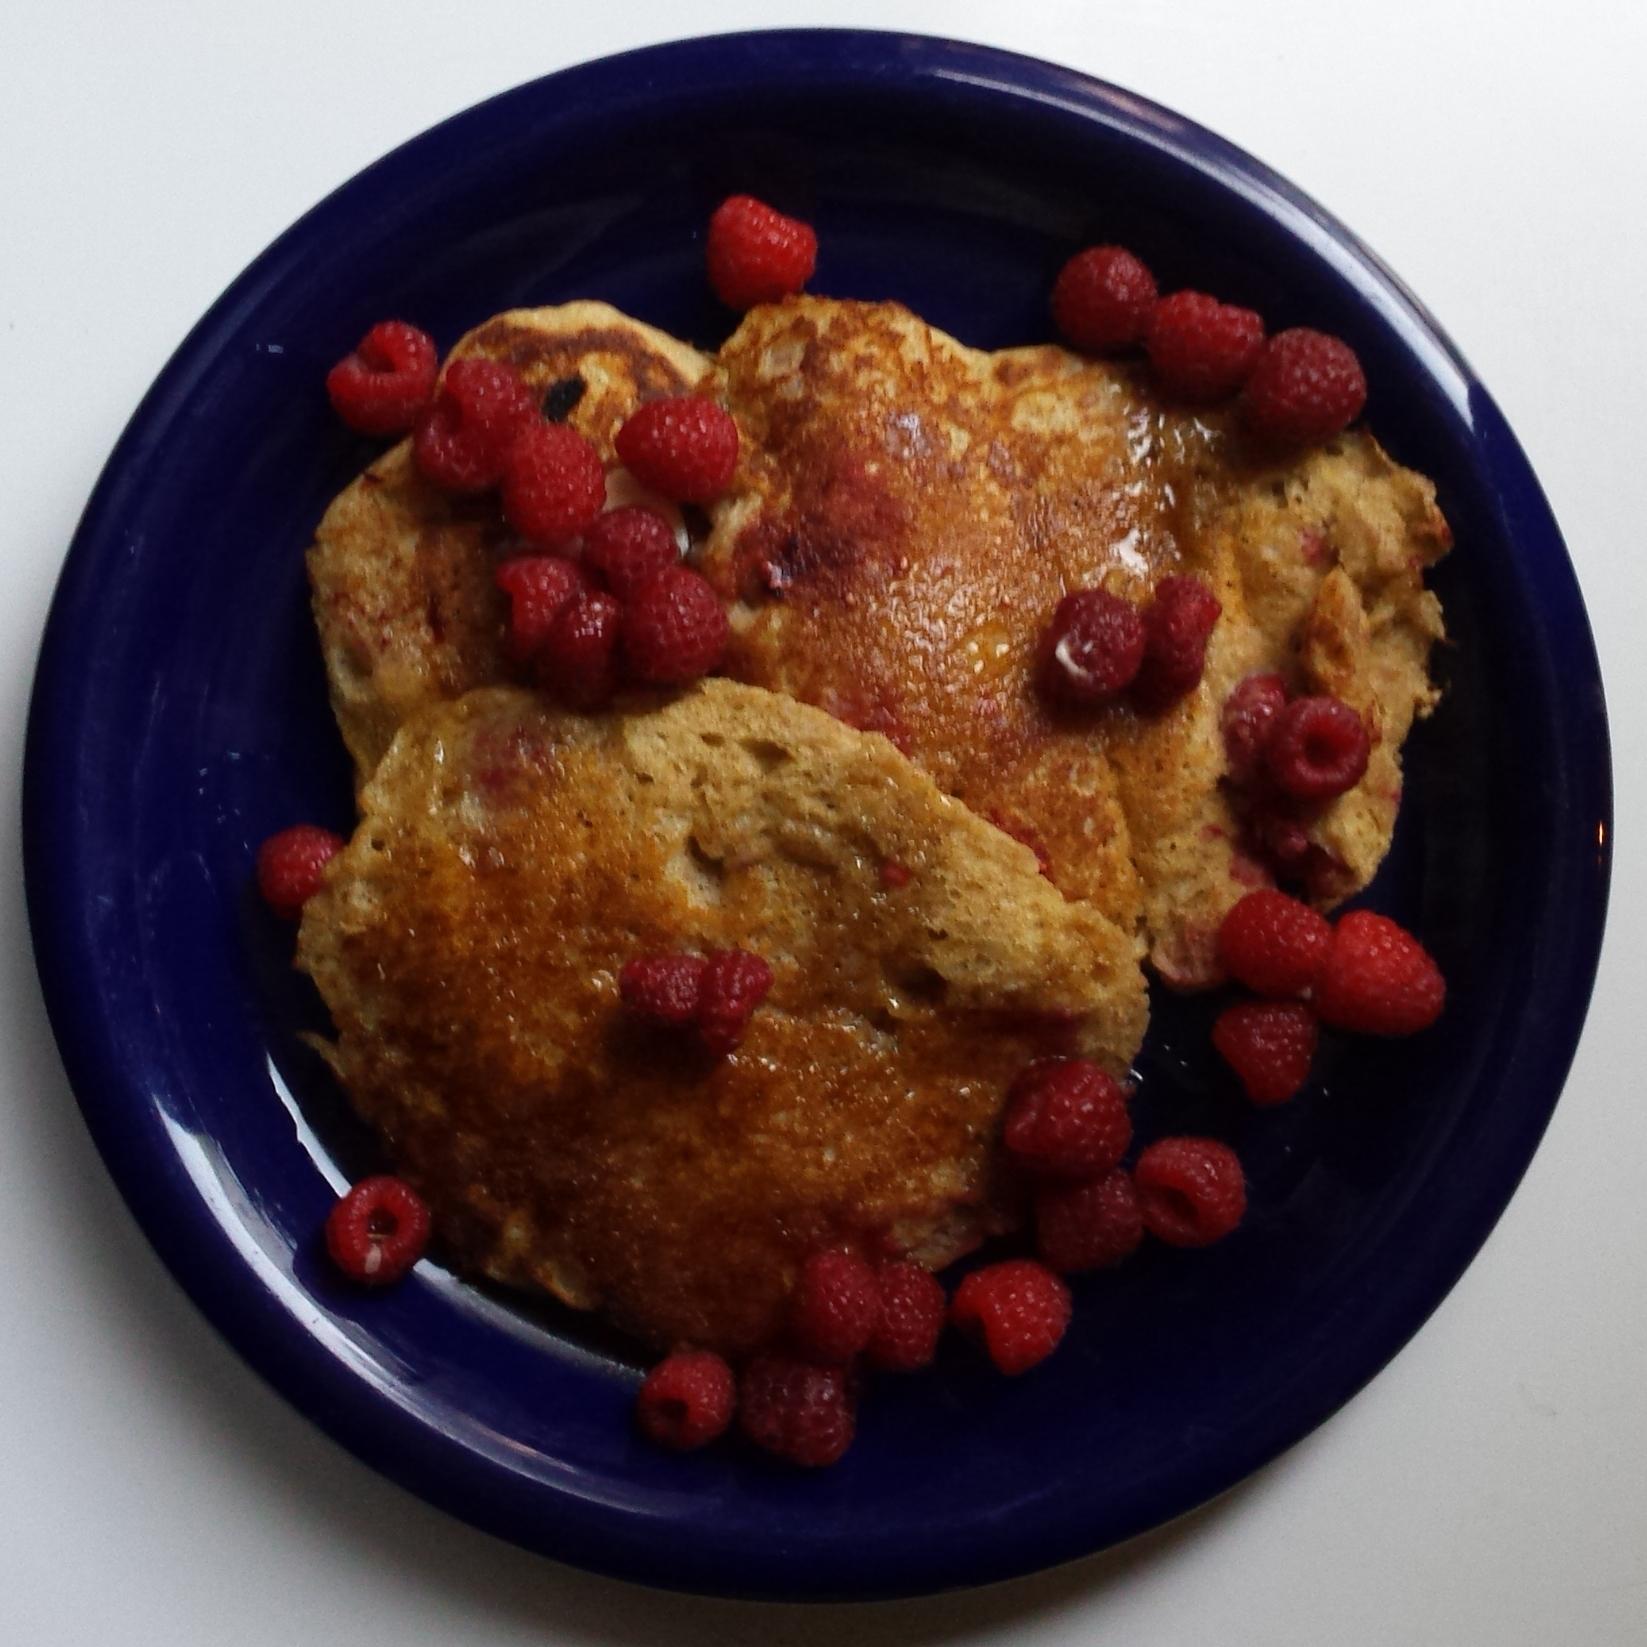 Smitten Kitchen Pancakes: Whole Wheat Raspberry Yogurt Pancakes